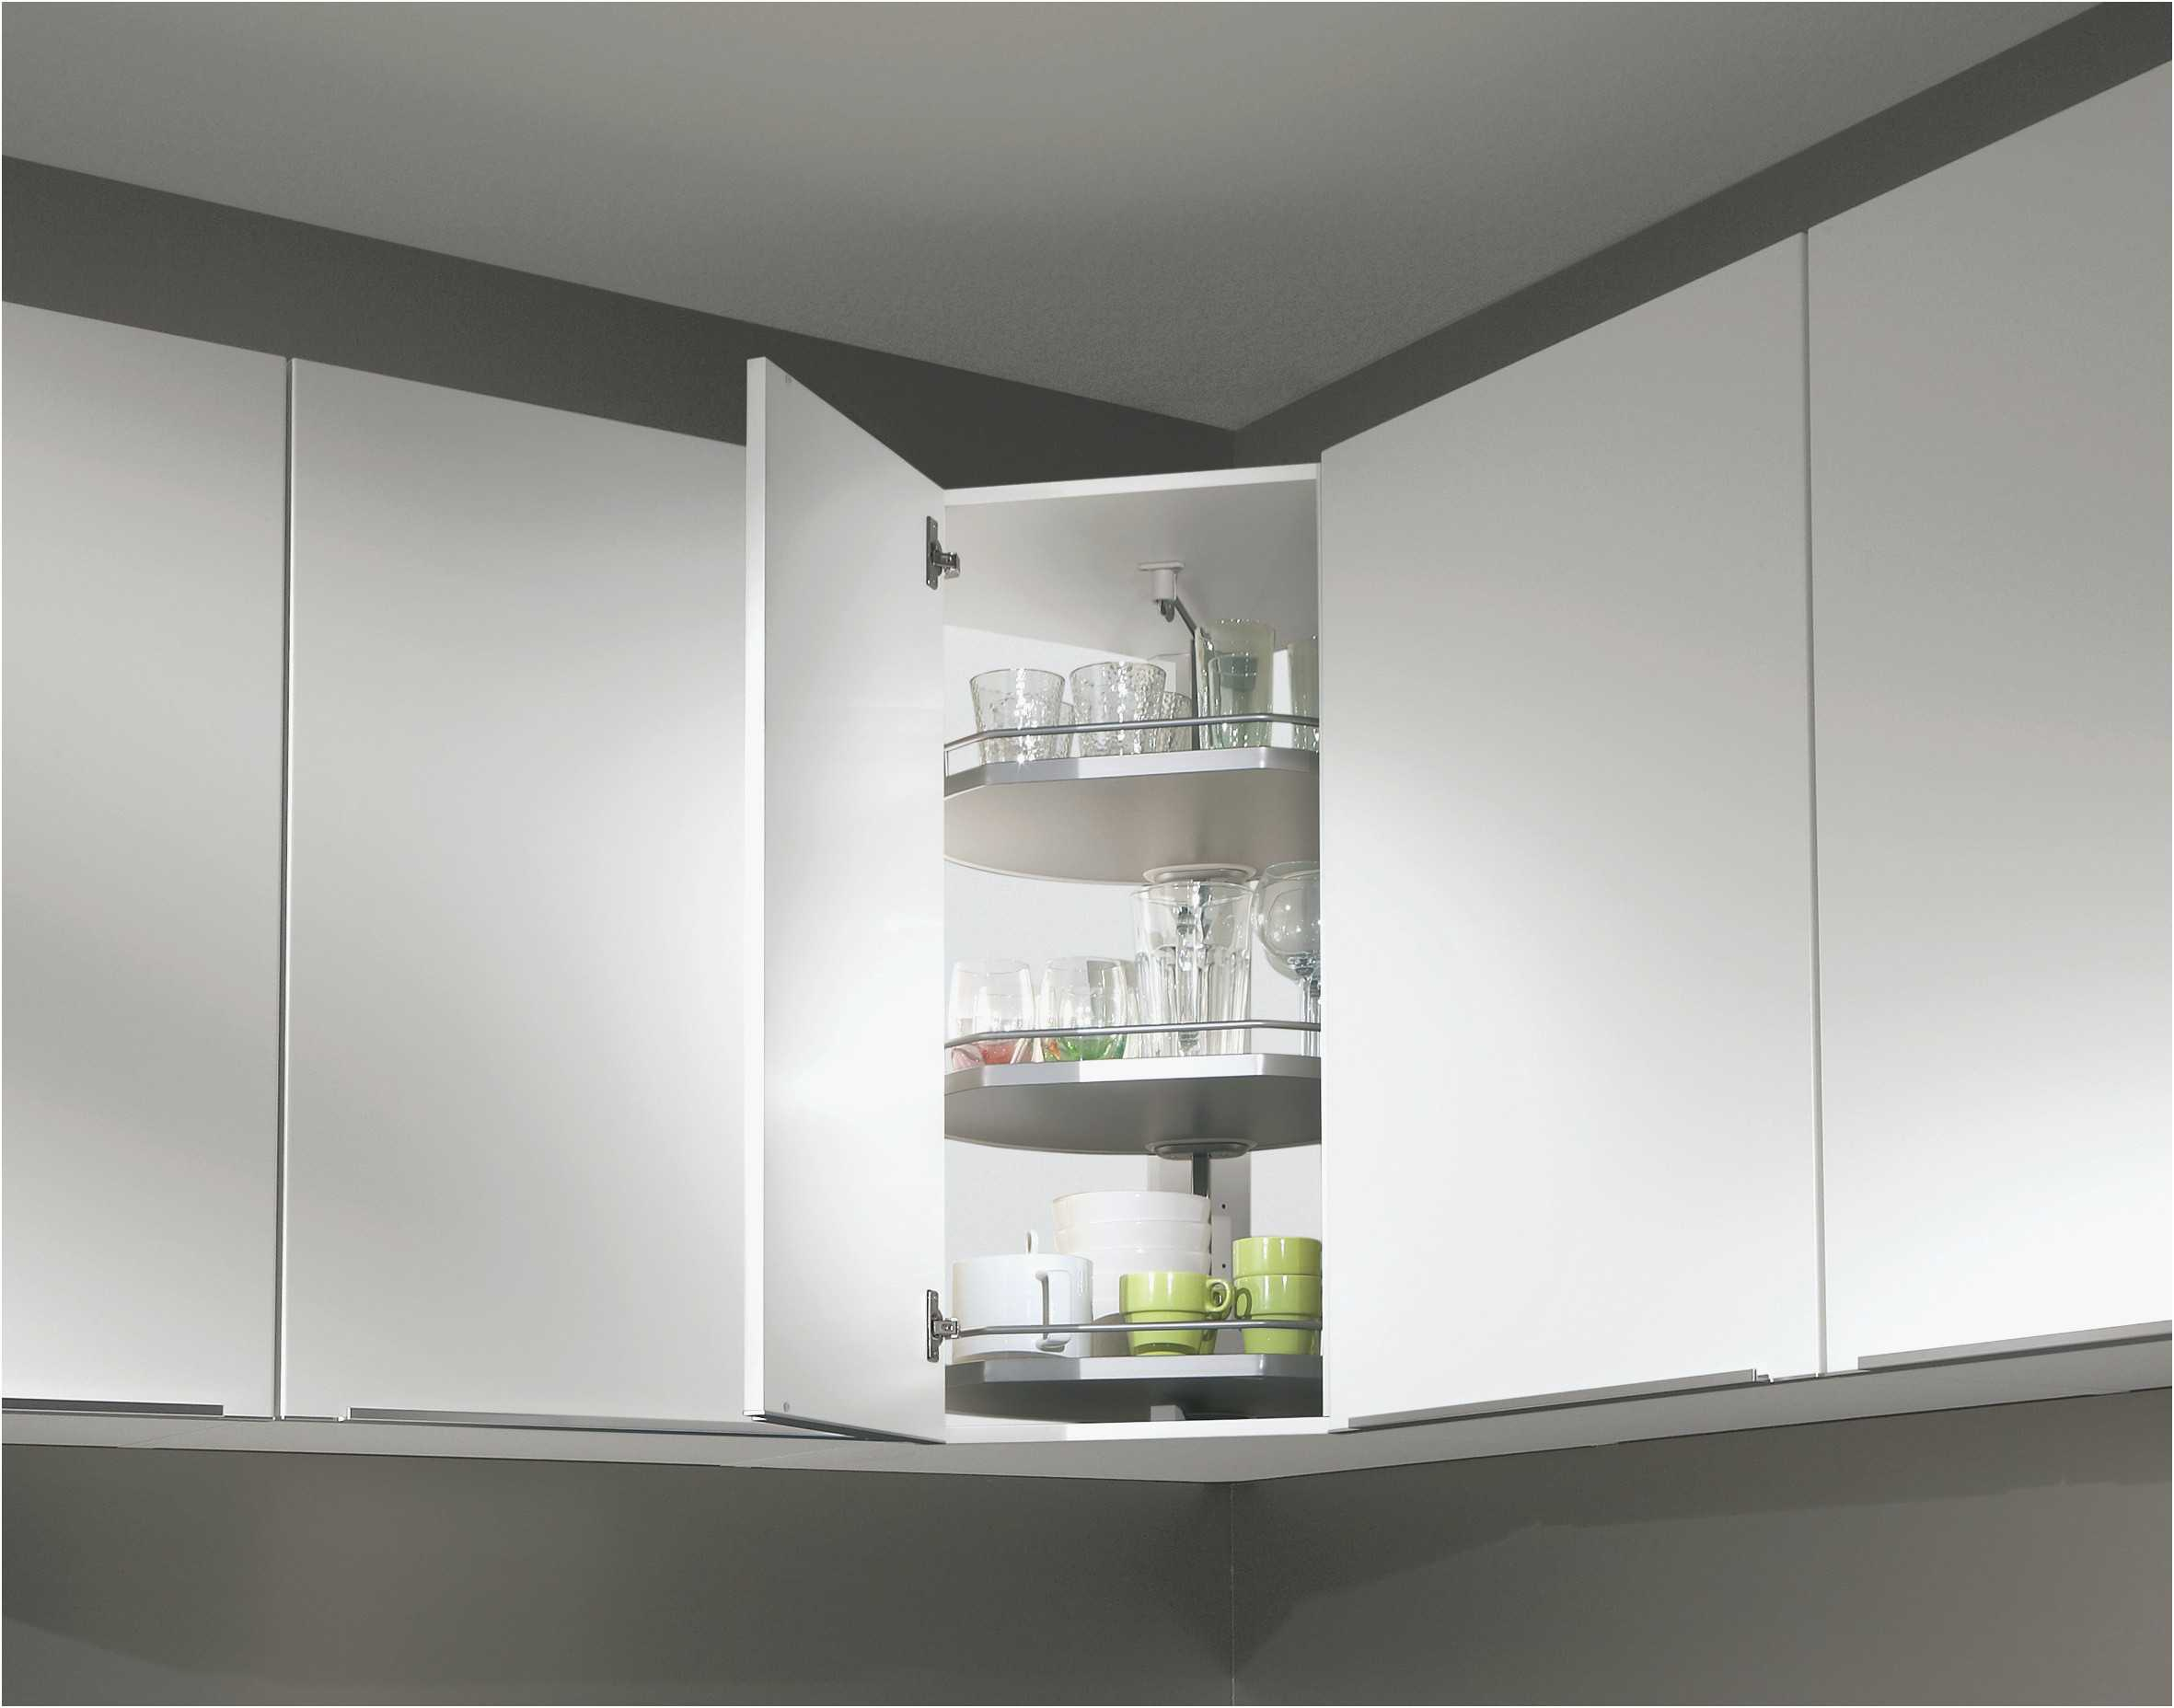 Ikea Idee Angle Pour Haut Cuisine Meuble Ozukxip